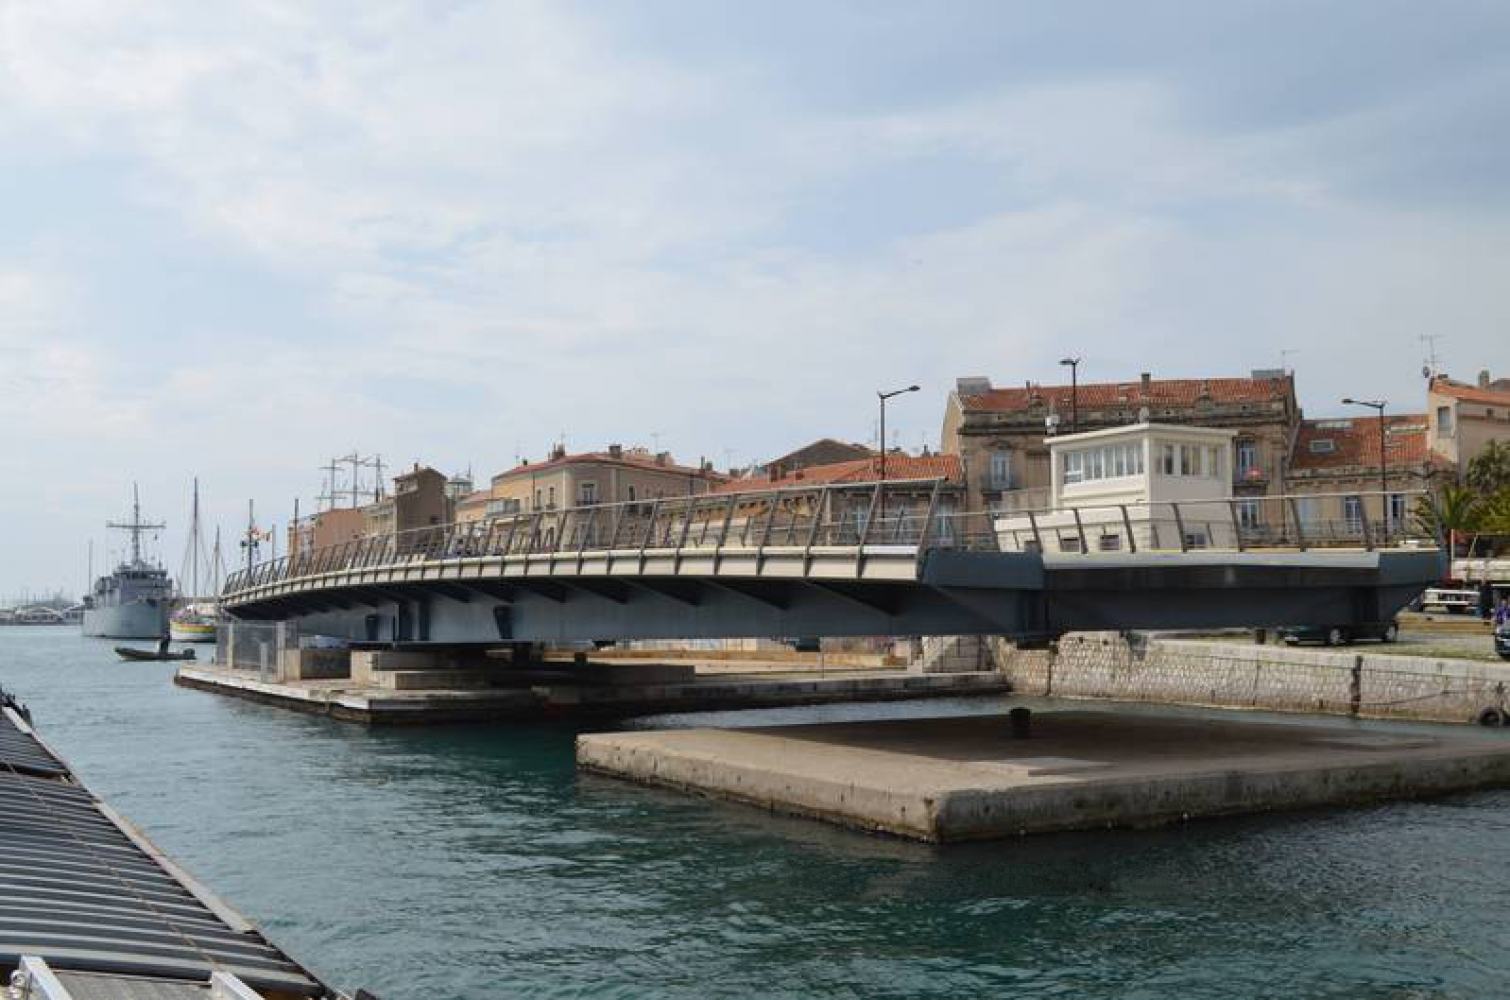 04-sete-img-007 Pascale SEURIN Architecte - Divers